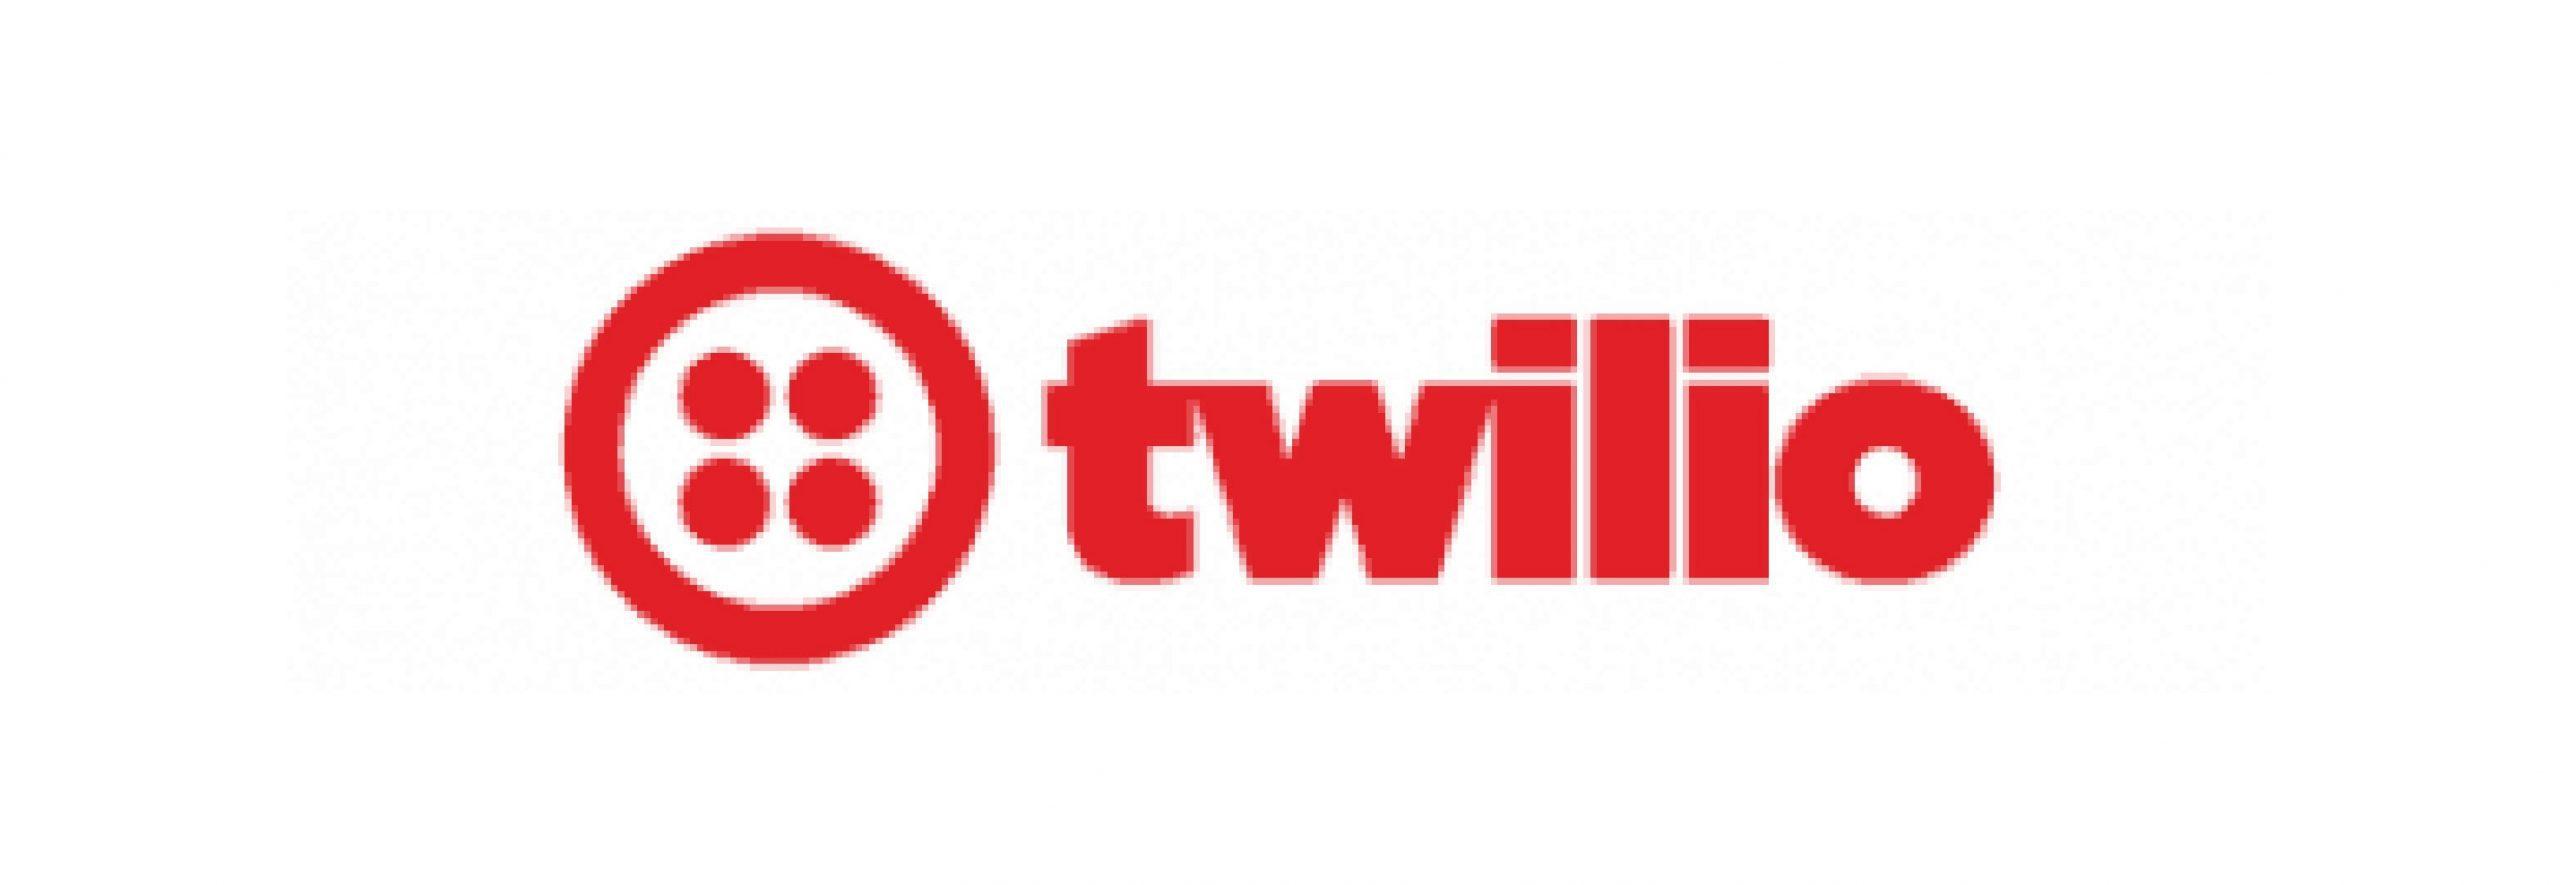 twillo-01-min-min